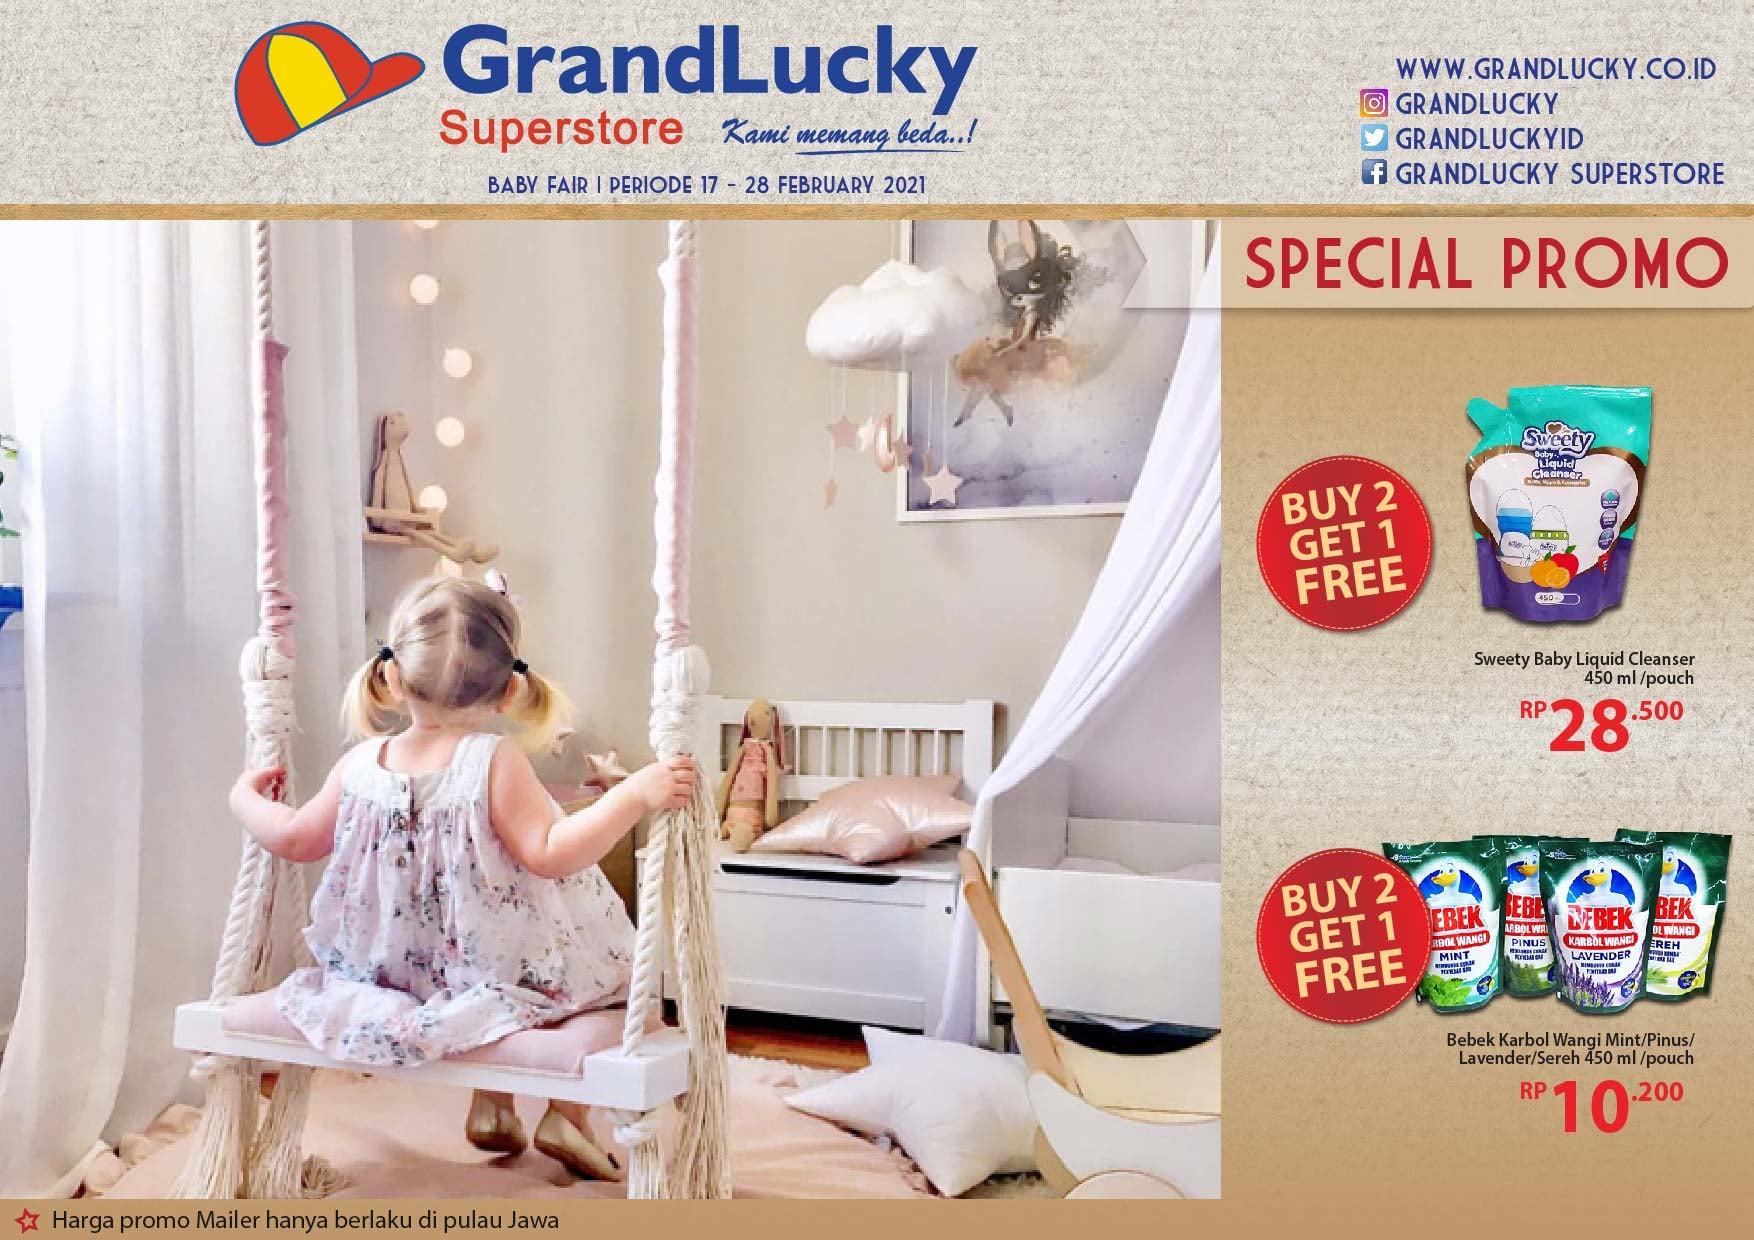 Promo GRAND LUCKY Superstore Katalog Mingguan Periode 17-28 Februari 2021